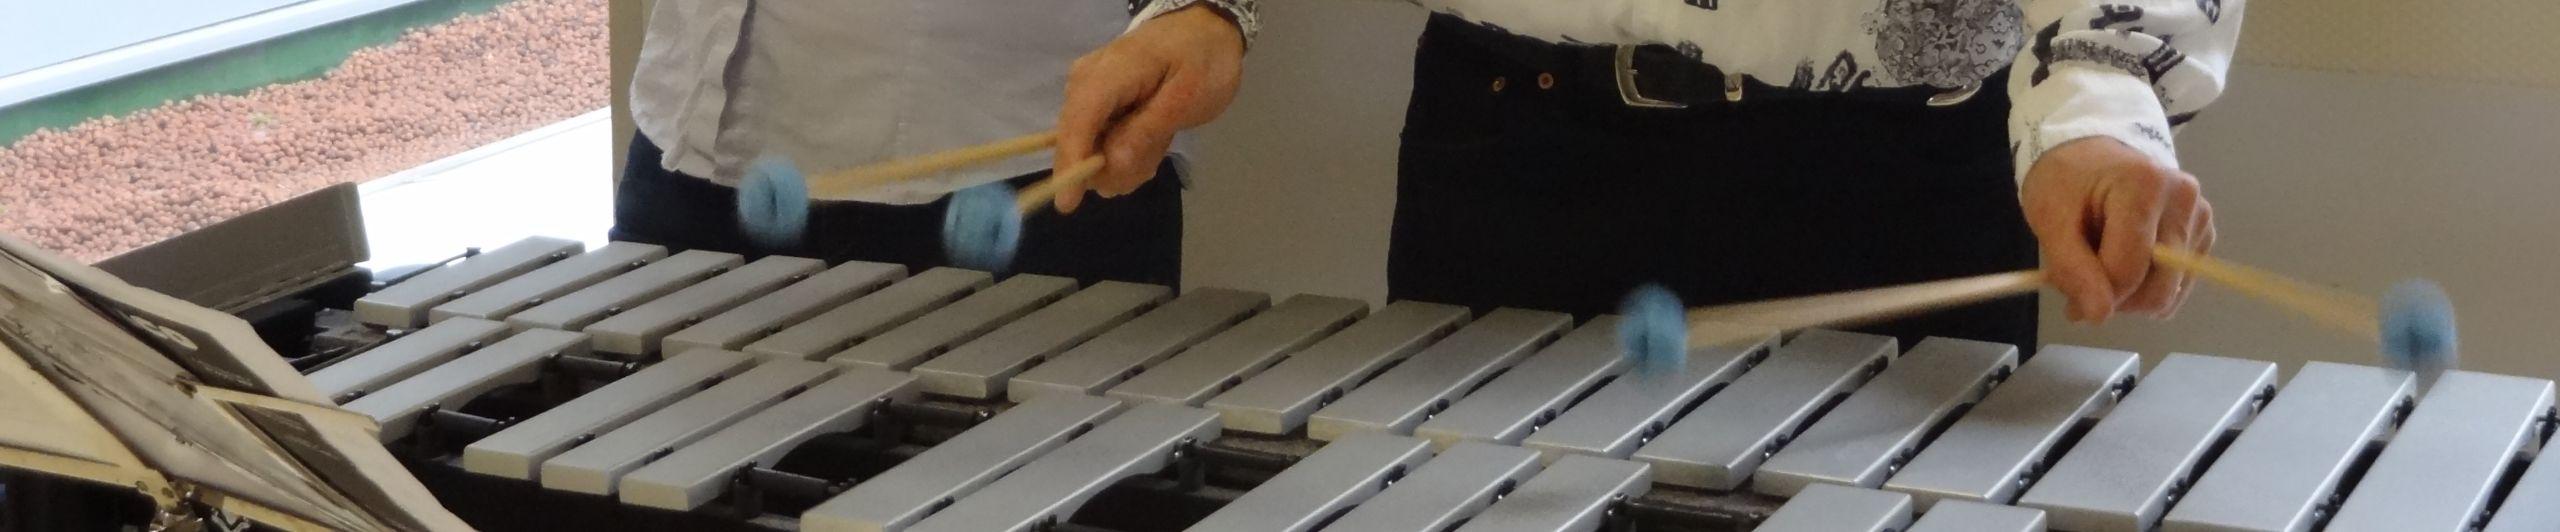 Flutisticks !